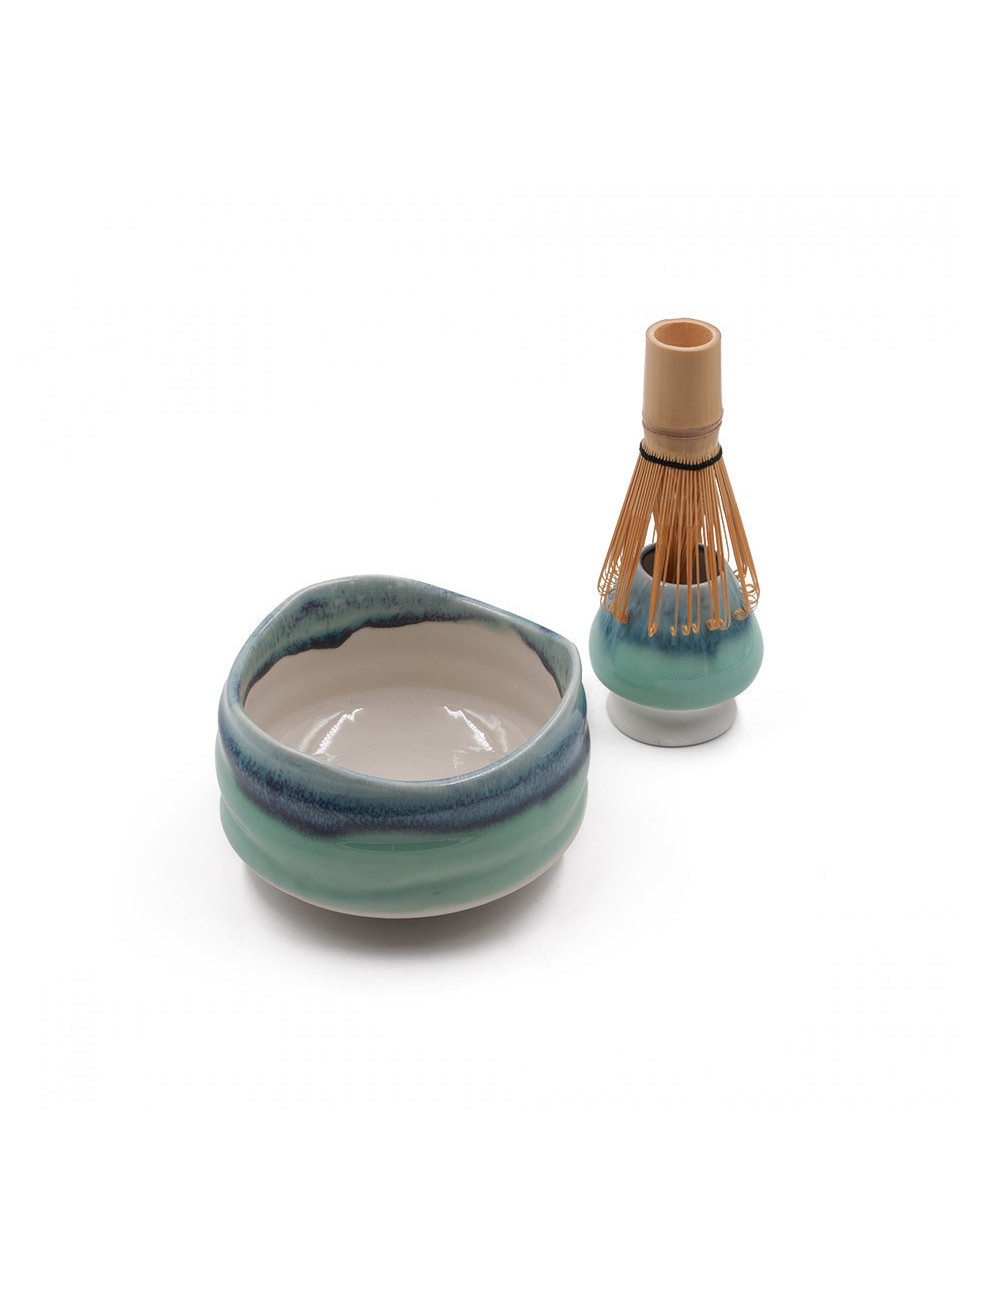 Set per matcha Wabi-sabi ceramica raku: ciotola chawan, frullino in bamboo chasen e portafrullino - La Pianta del Tè shop online